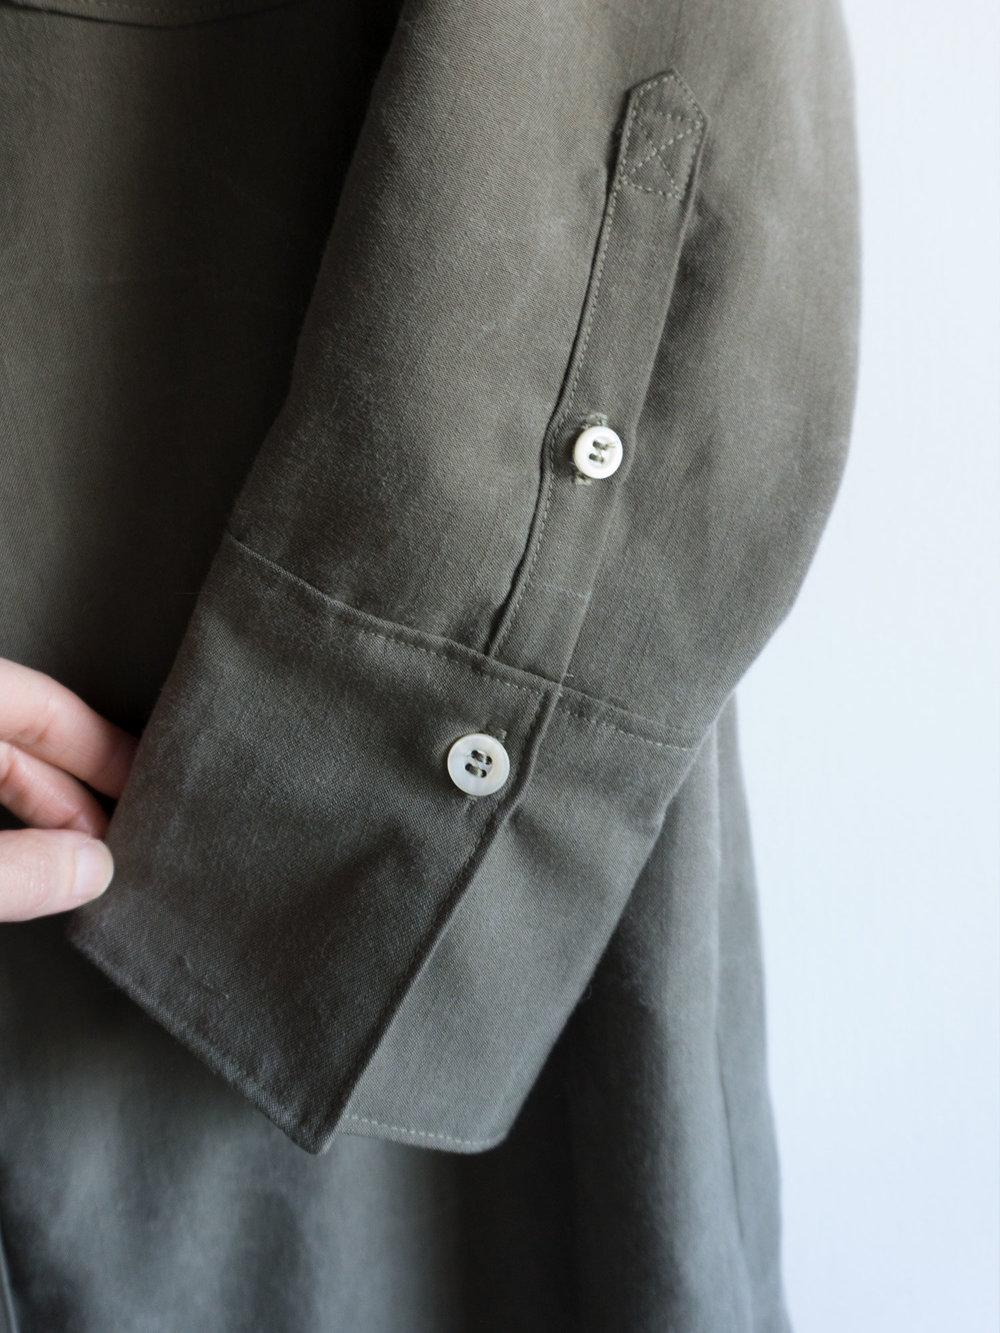 Kalle Shirtdress Sleeve Expansion Pattern by Closet Case Patterns | Sew DIY